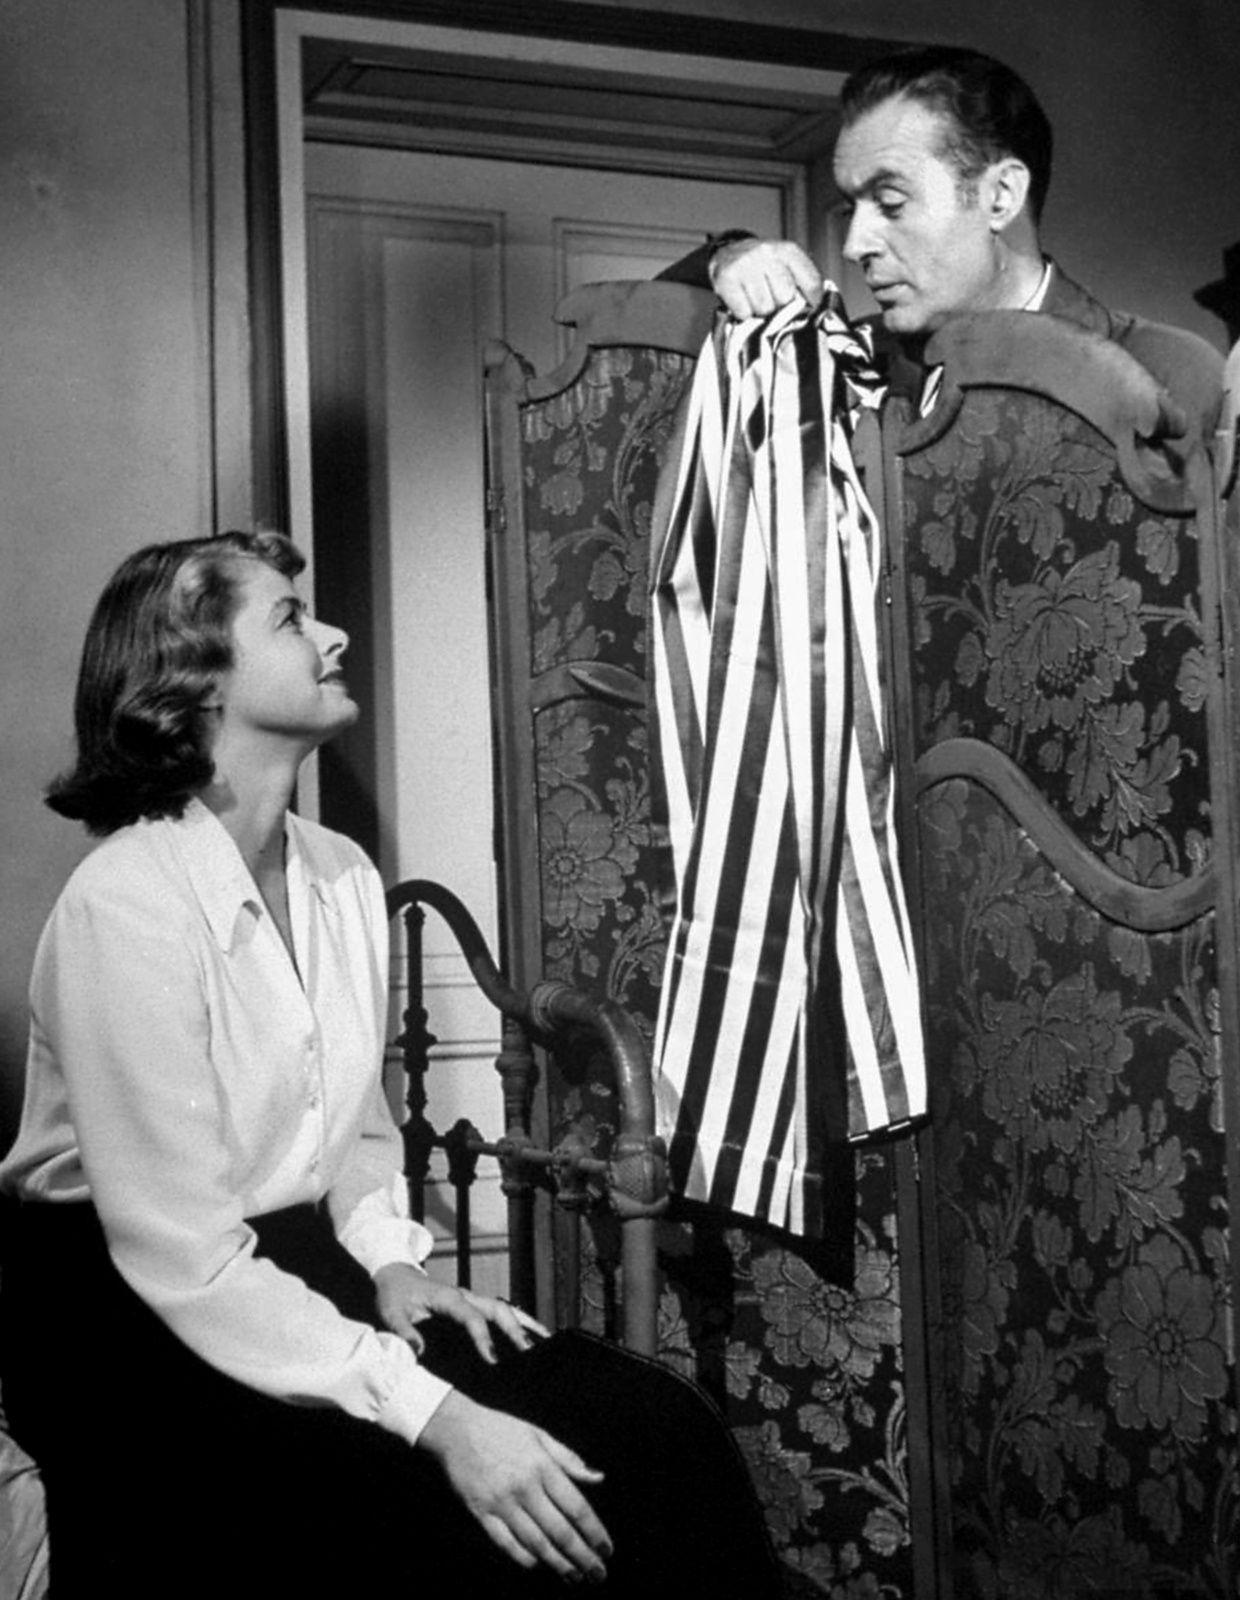 Ingrid Bergman with Charles Boyer